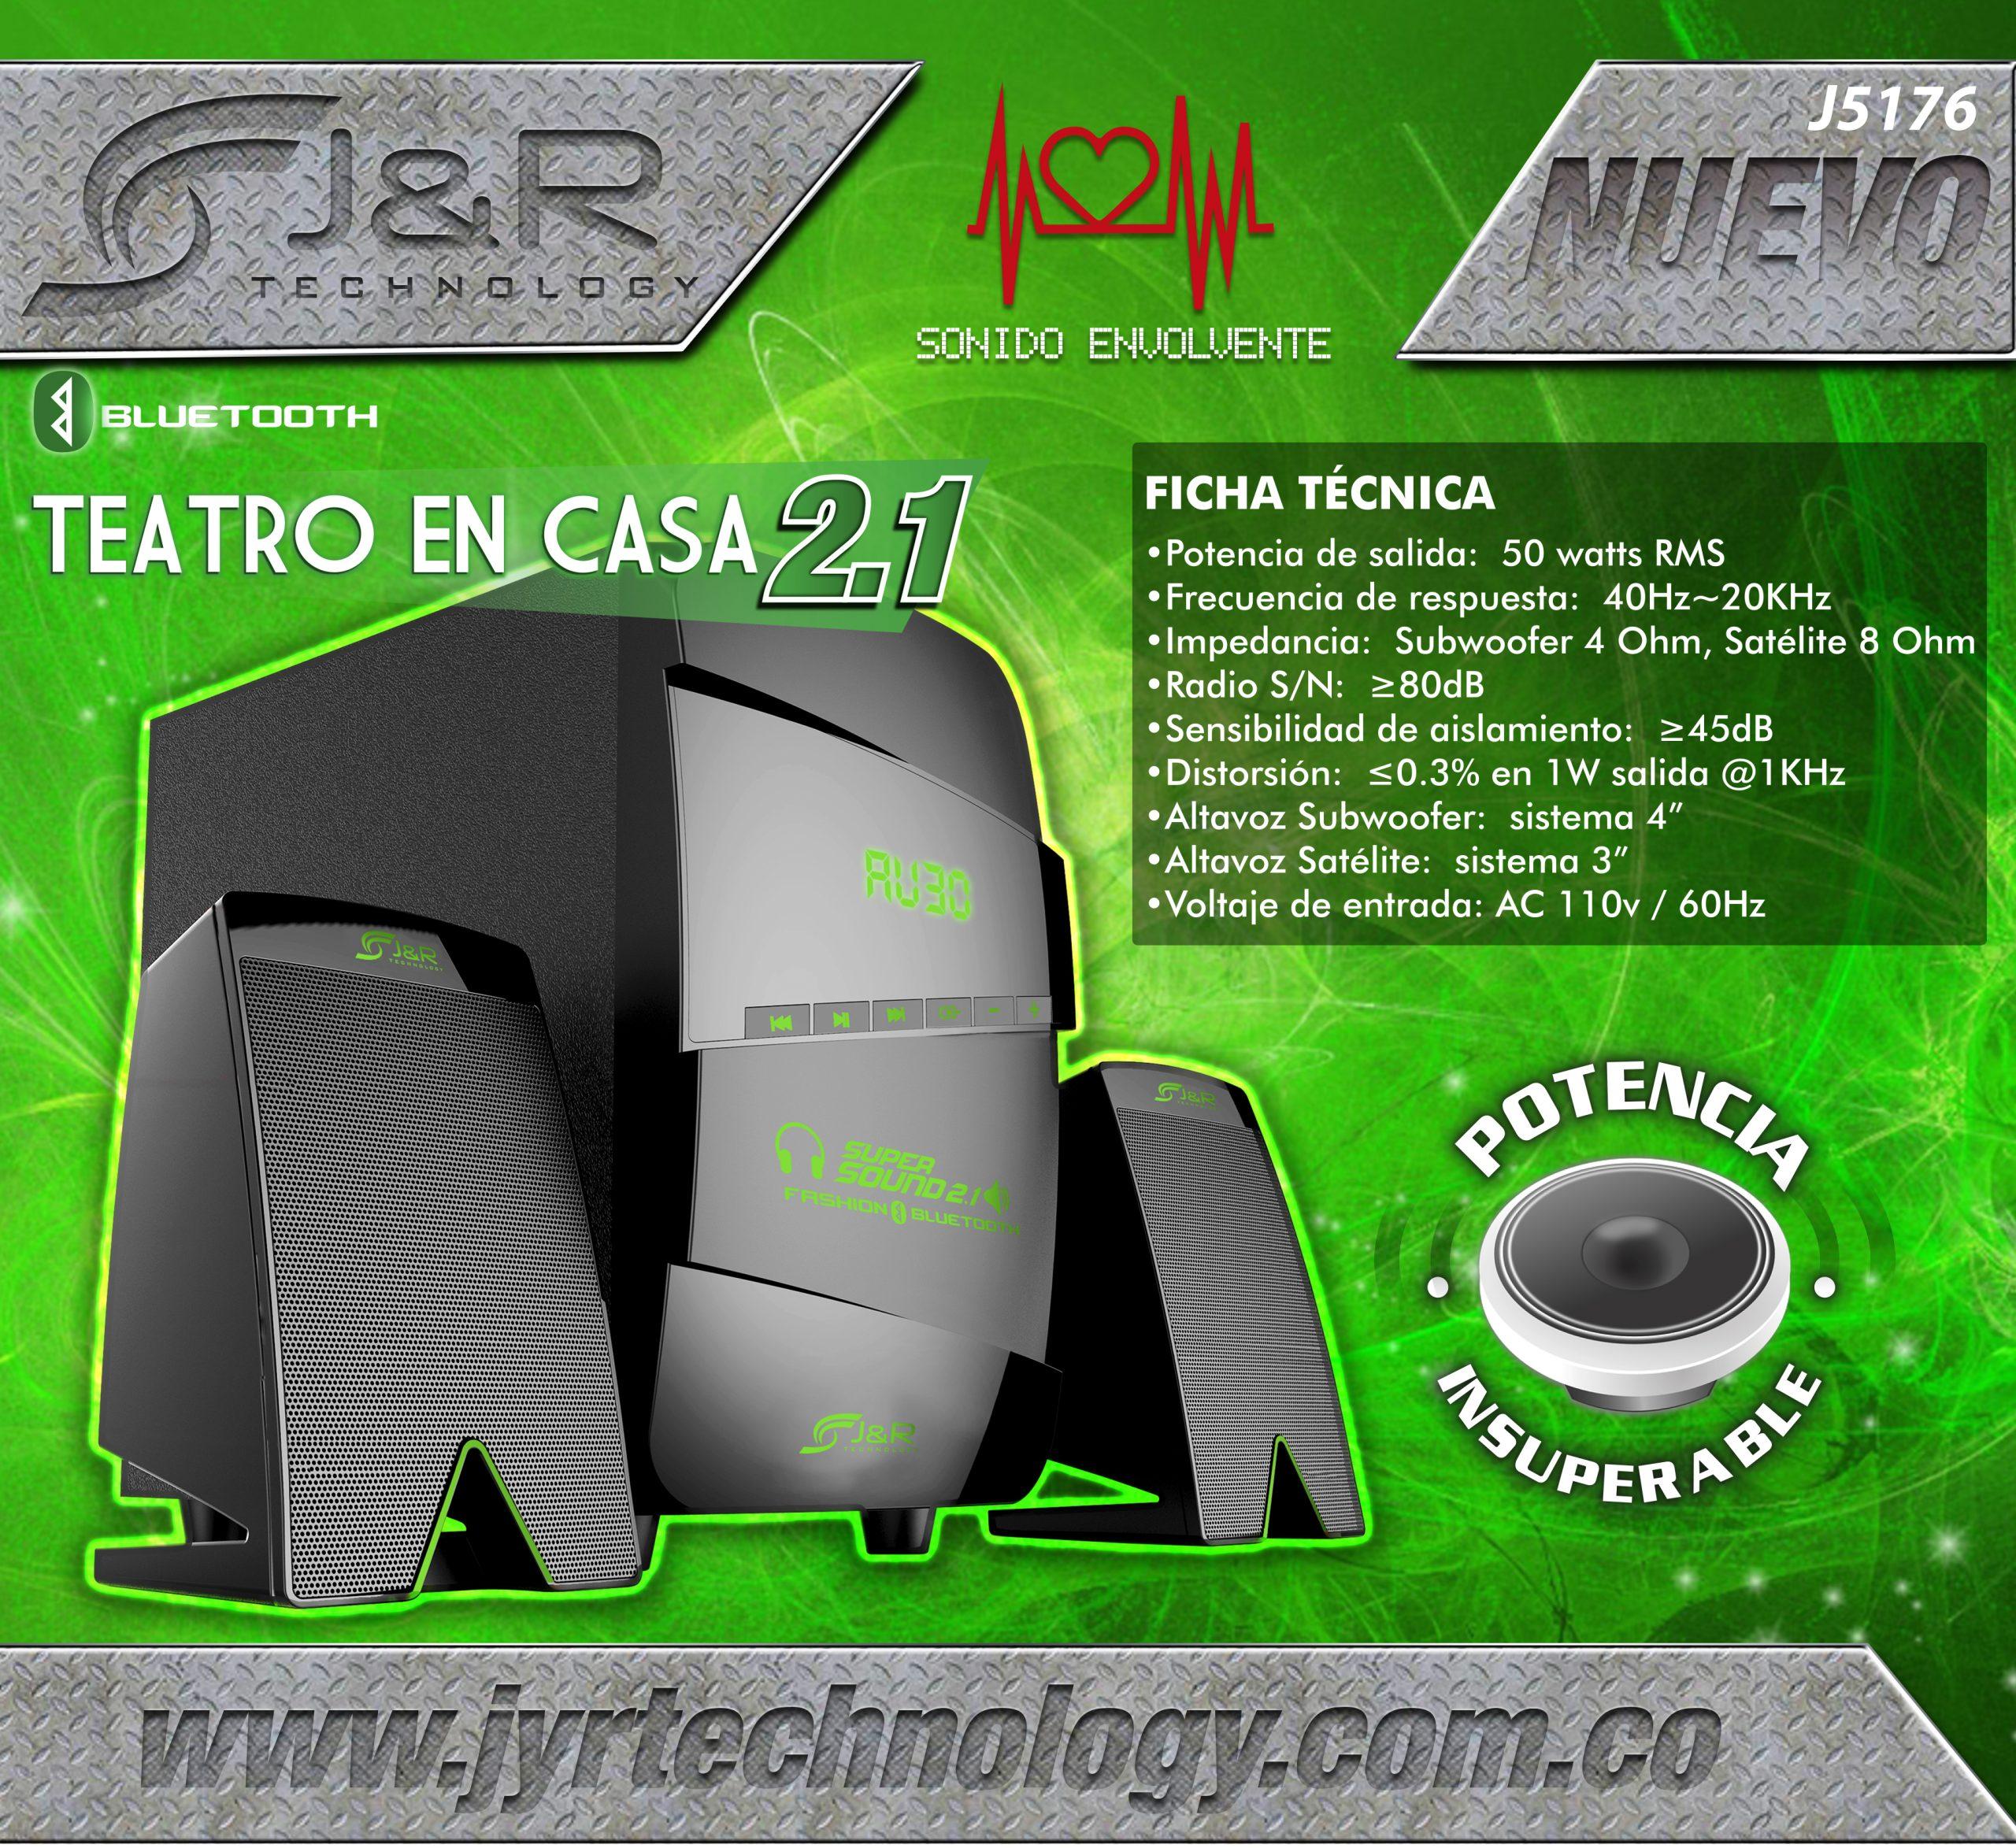 Brochure 5176 Teatro 2.1 Nuevos Teatros 2.1 J&R Technology